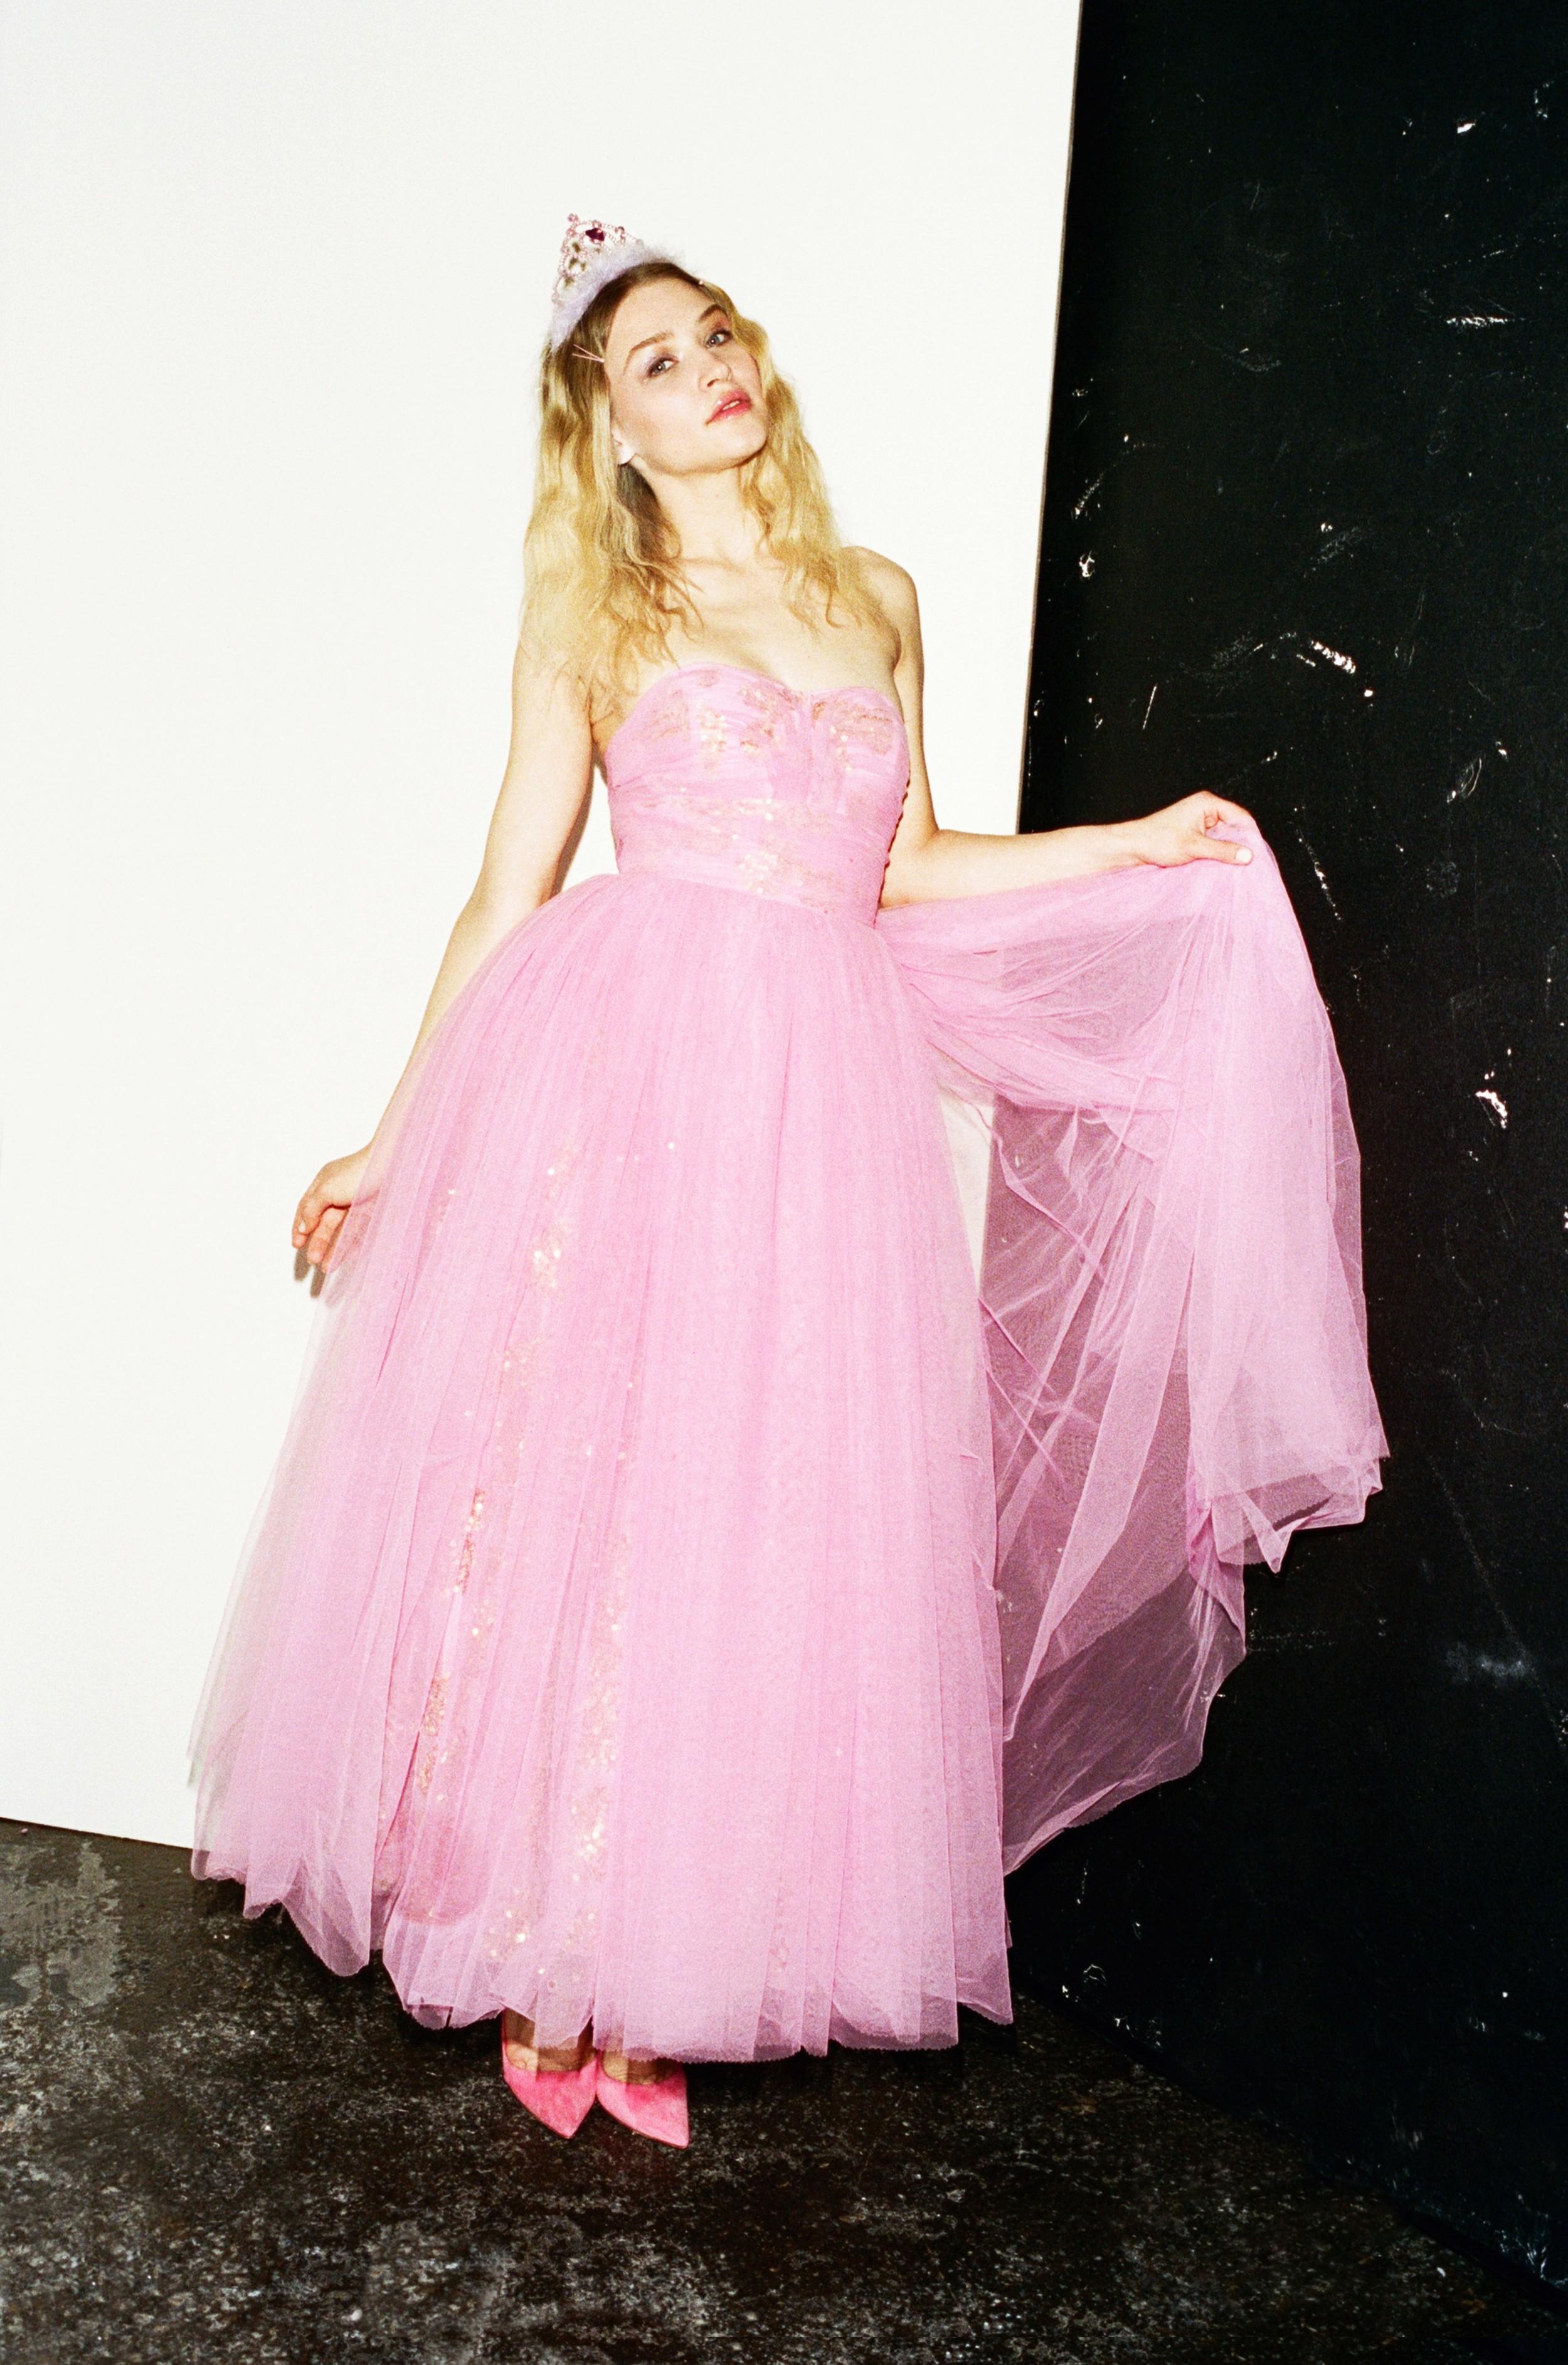 Ieva wears Pink Dress by Ashish, Pink Court Heels by Manolo Blahnik, Tiara - Stylist's Own